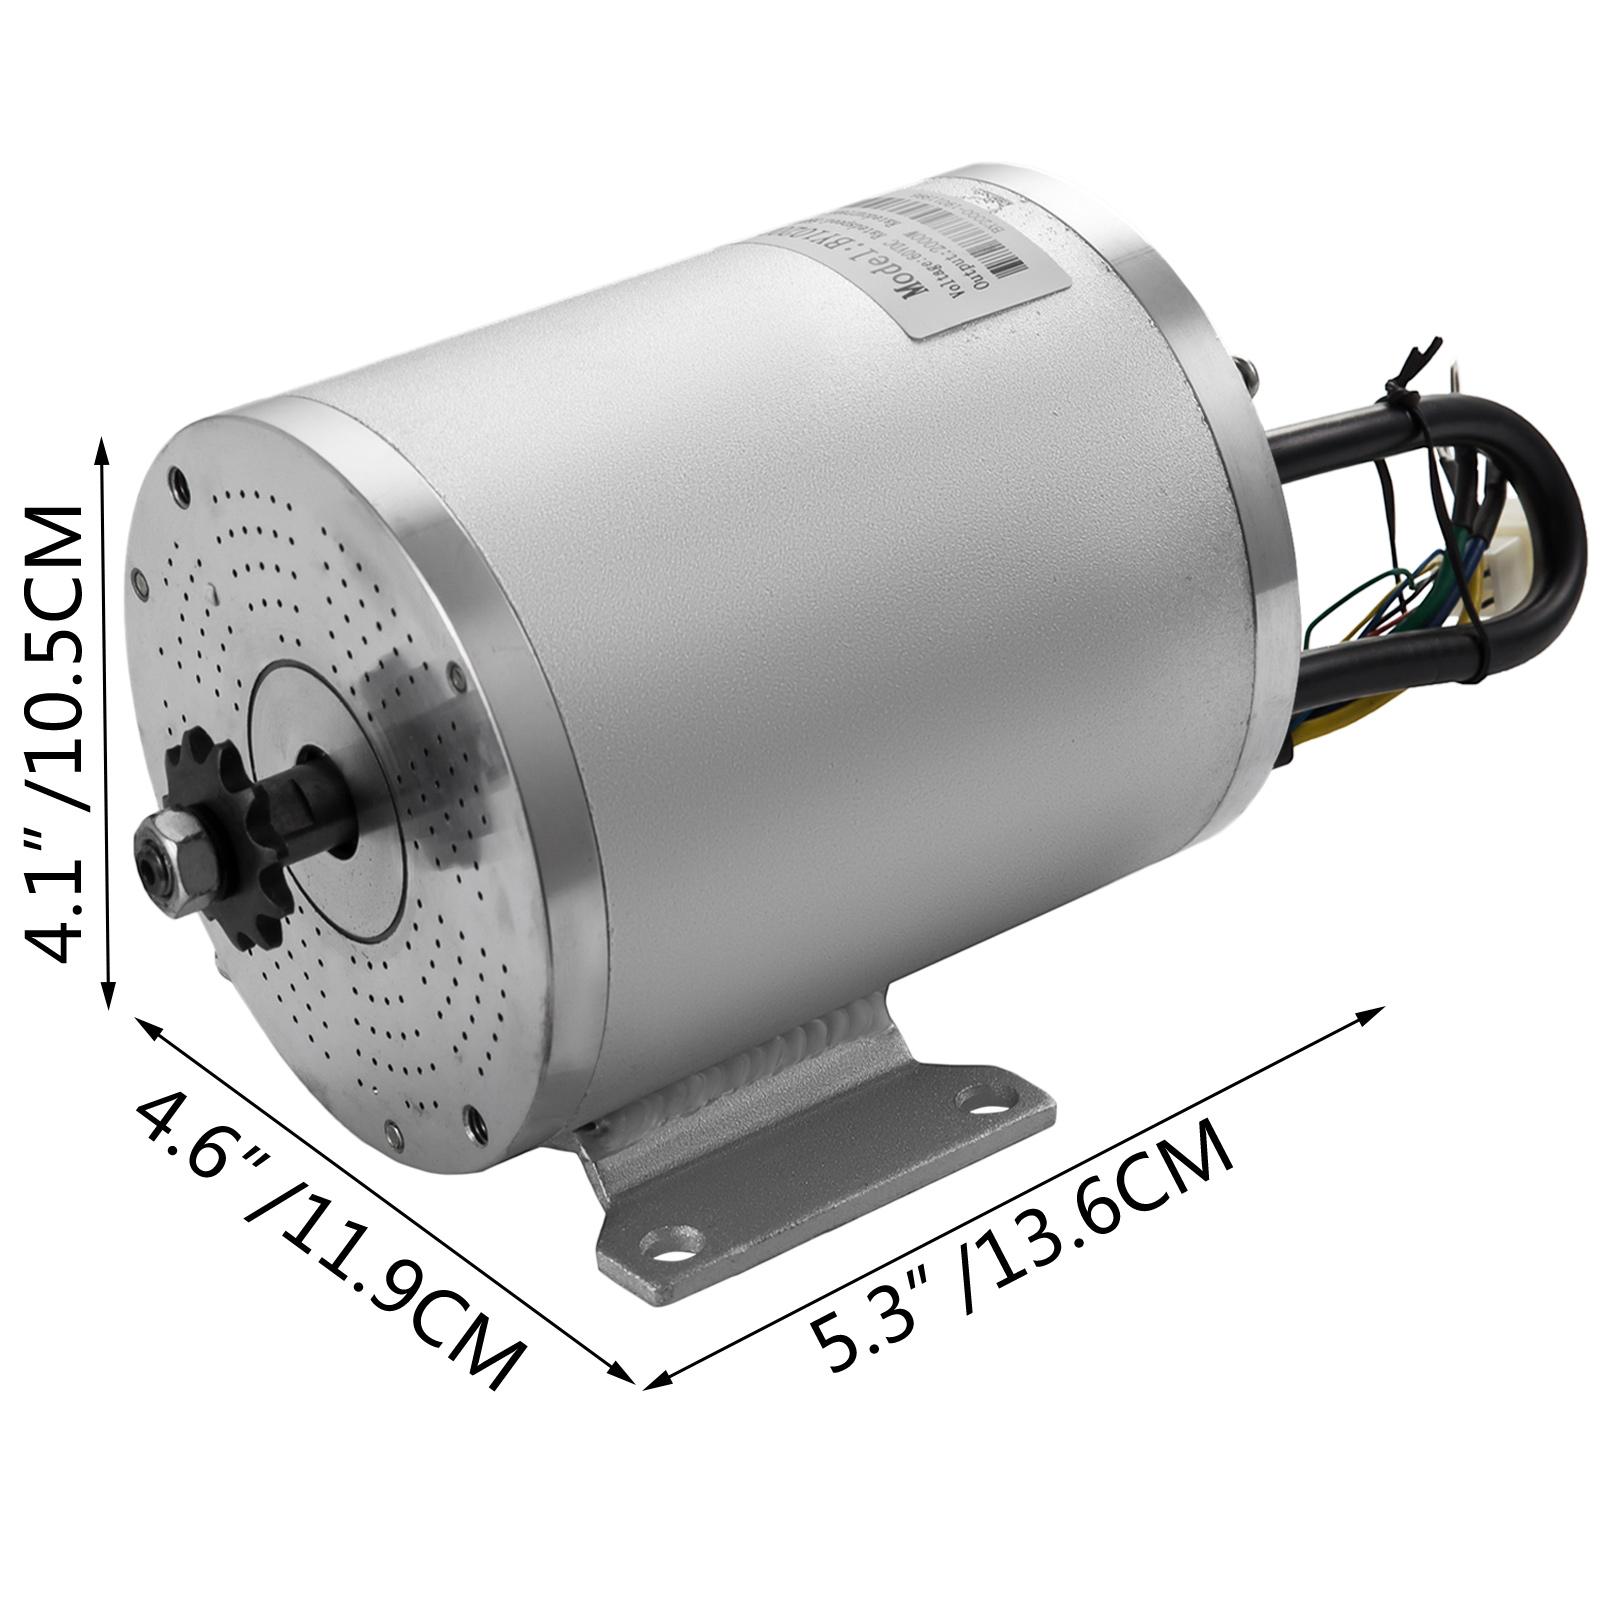 DC-electric-motor-12-60V-150W-2KW-for-scooter-bike-go-kart-minibike-e-ATV thumbnail 176